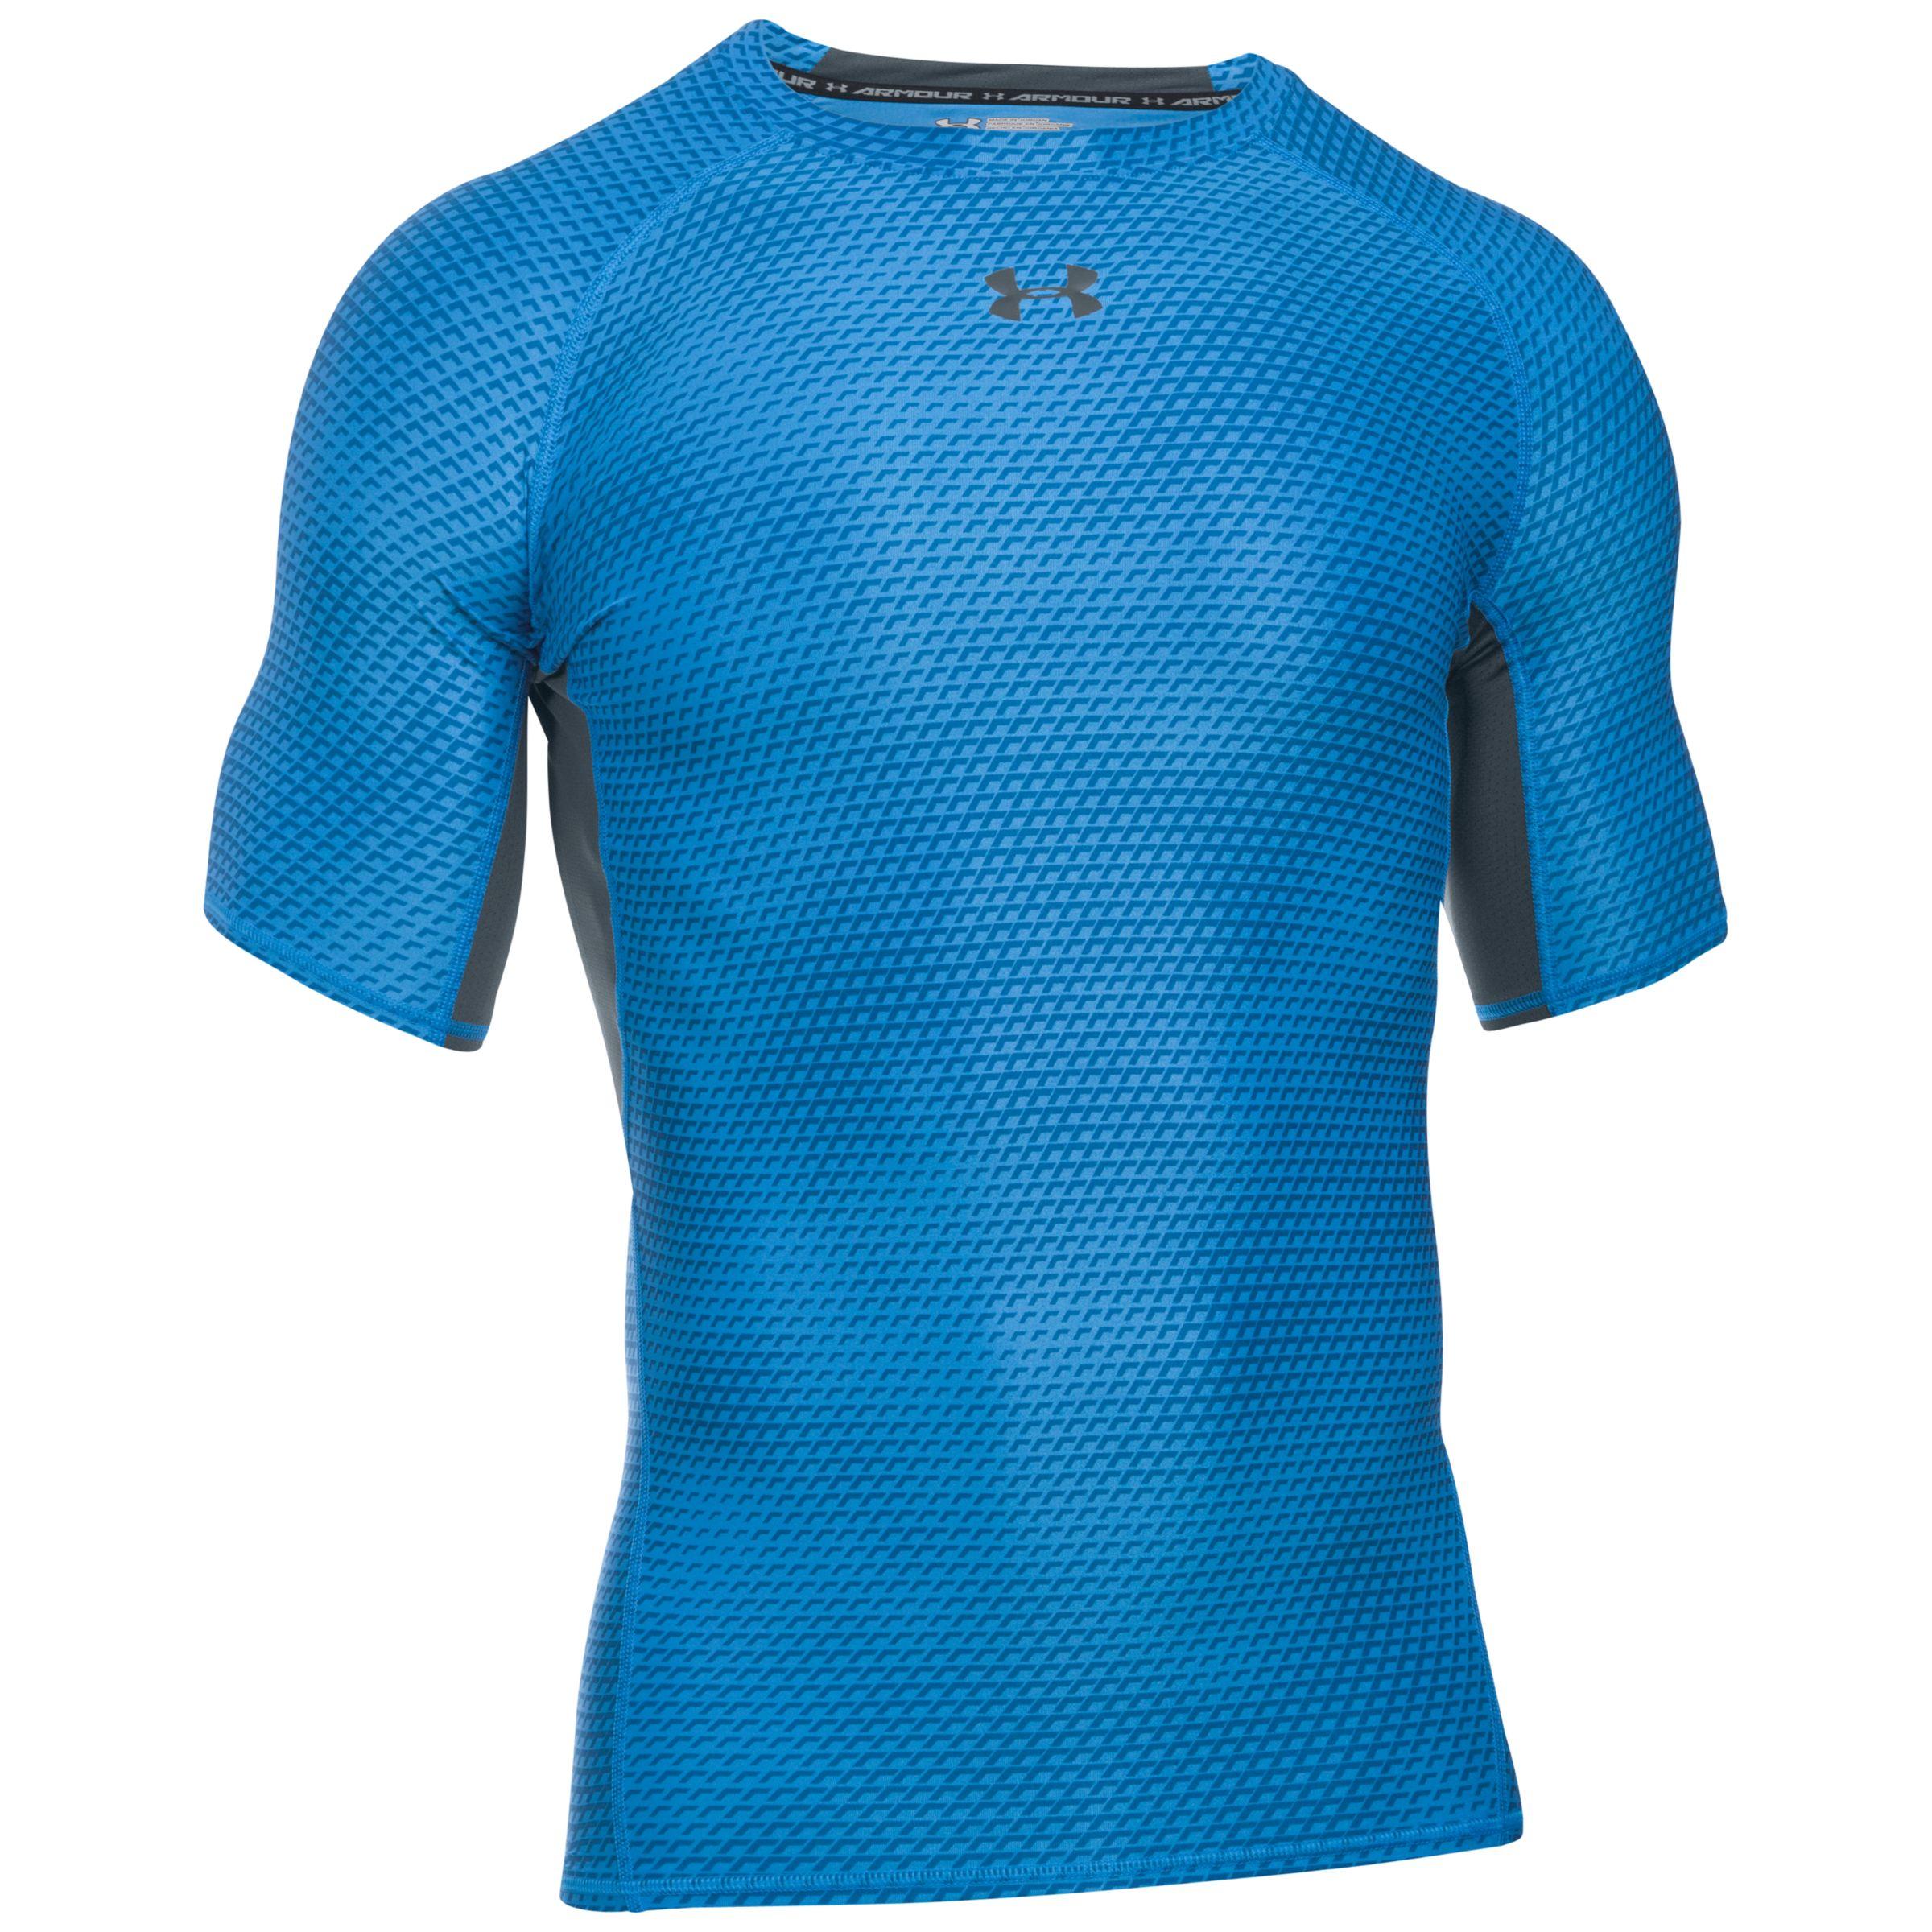 Under Armour HeatGear Printed Mens Compression Top Blue